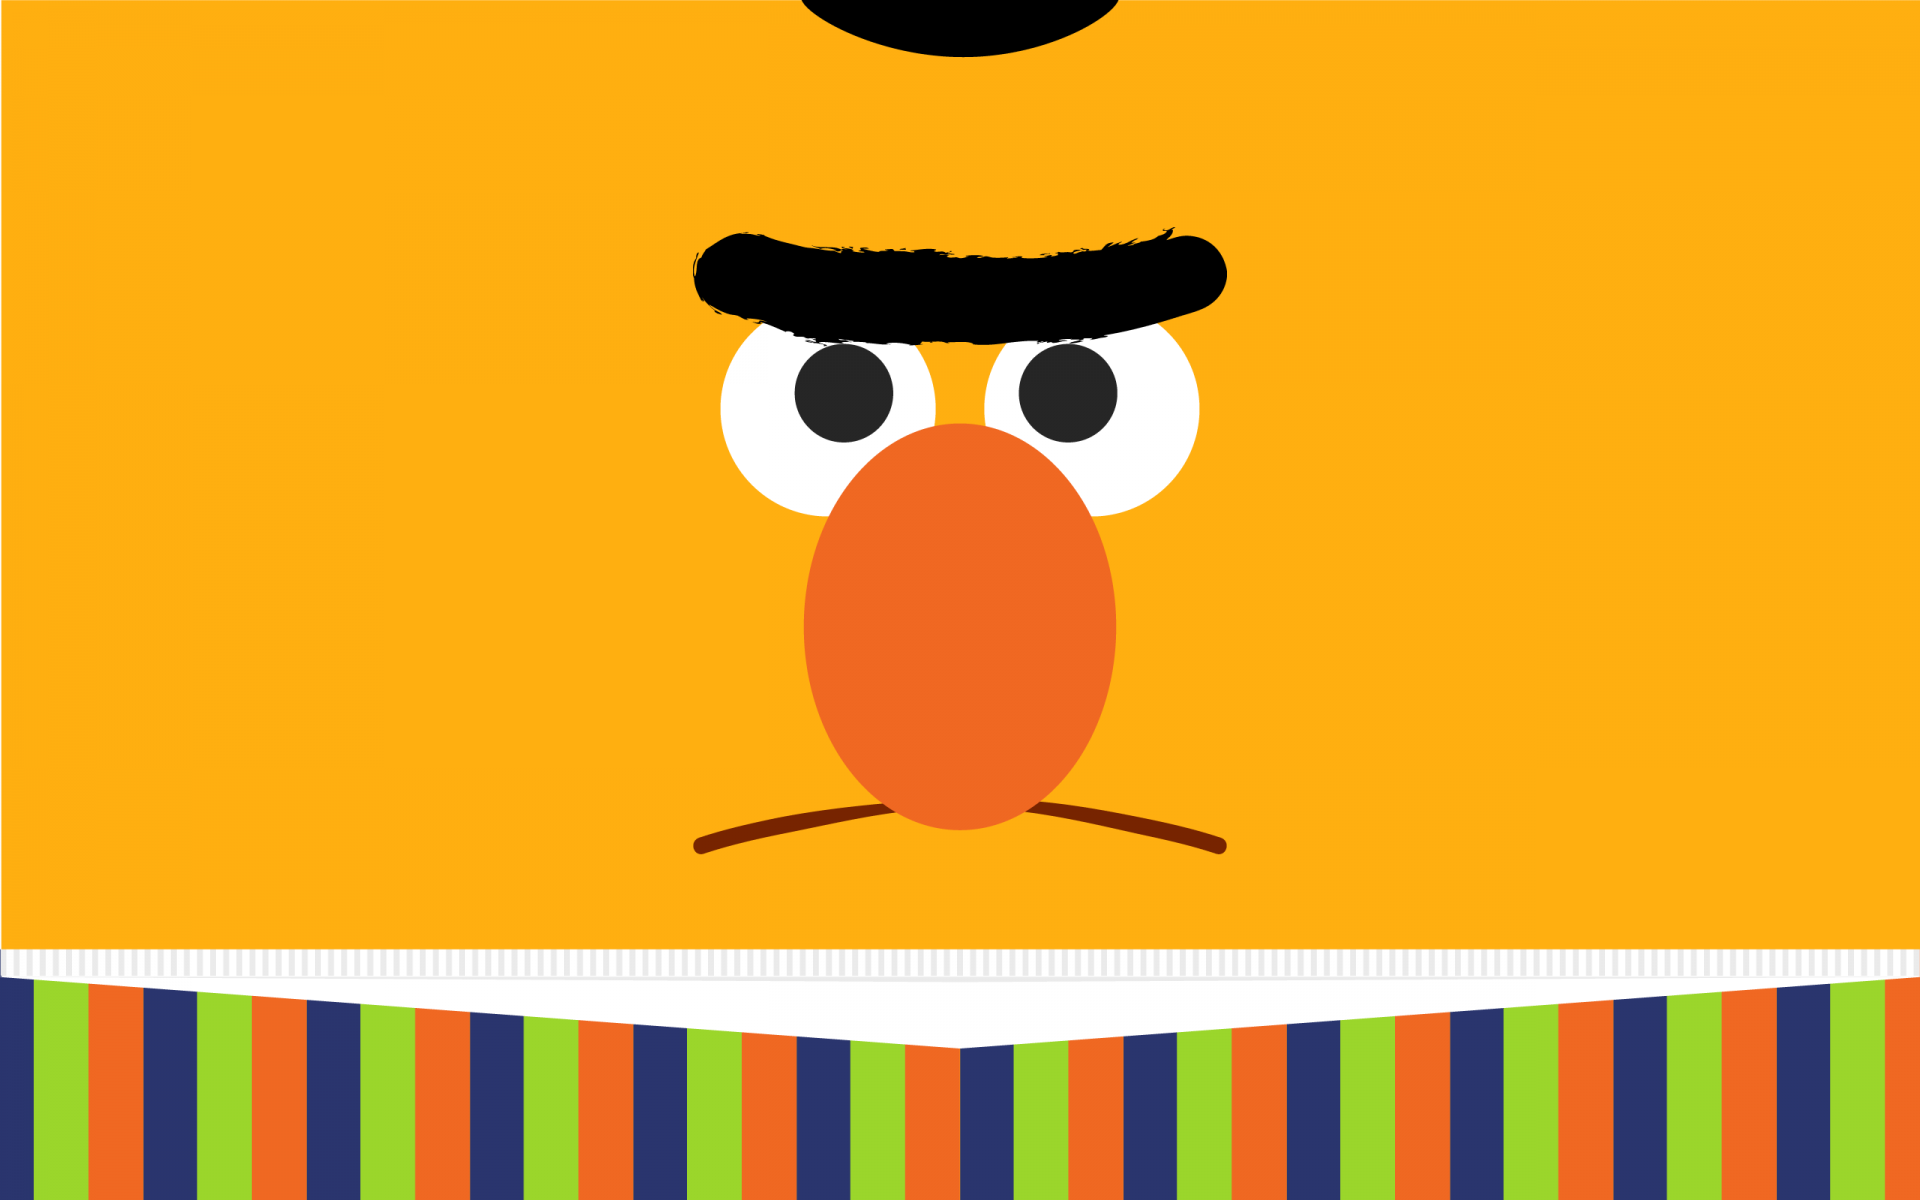 Wallpaper Of Bert From Sesame Street PaperPull 1920x1200